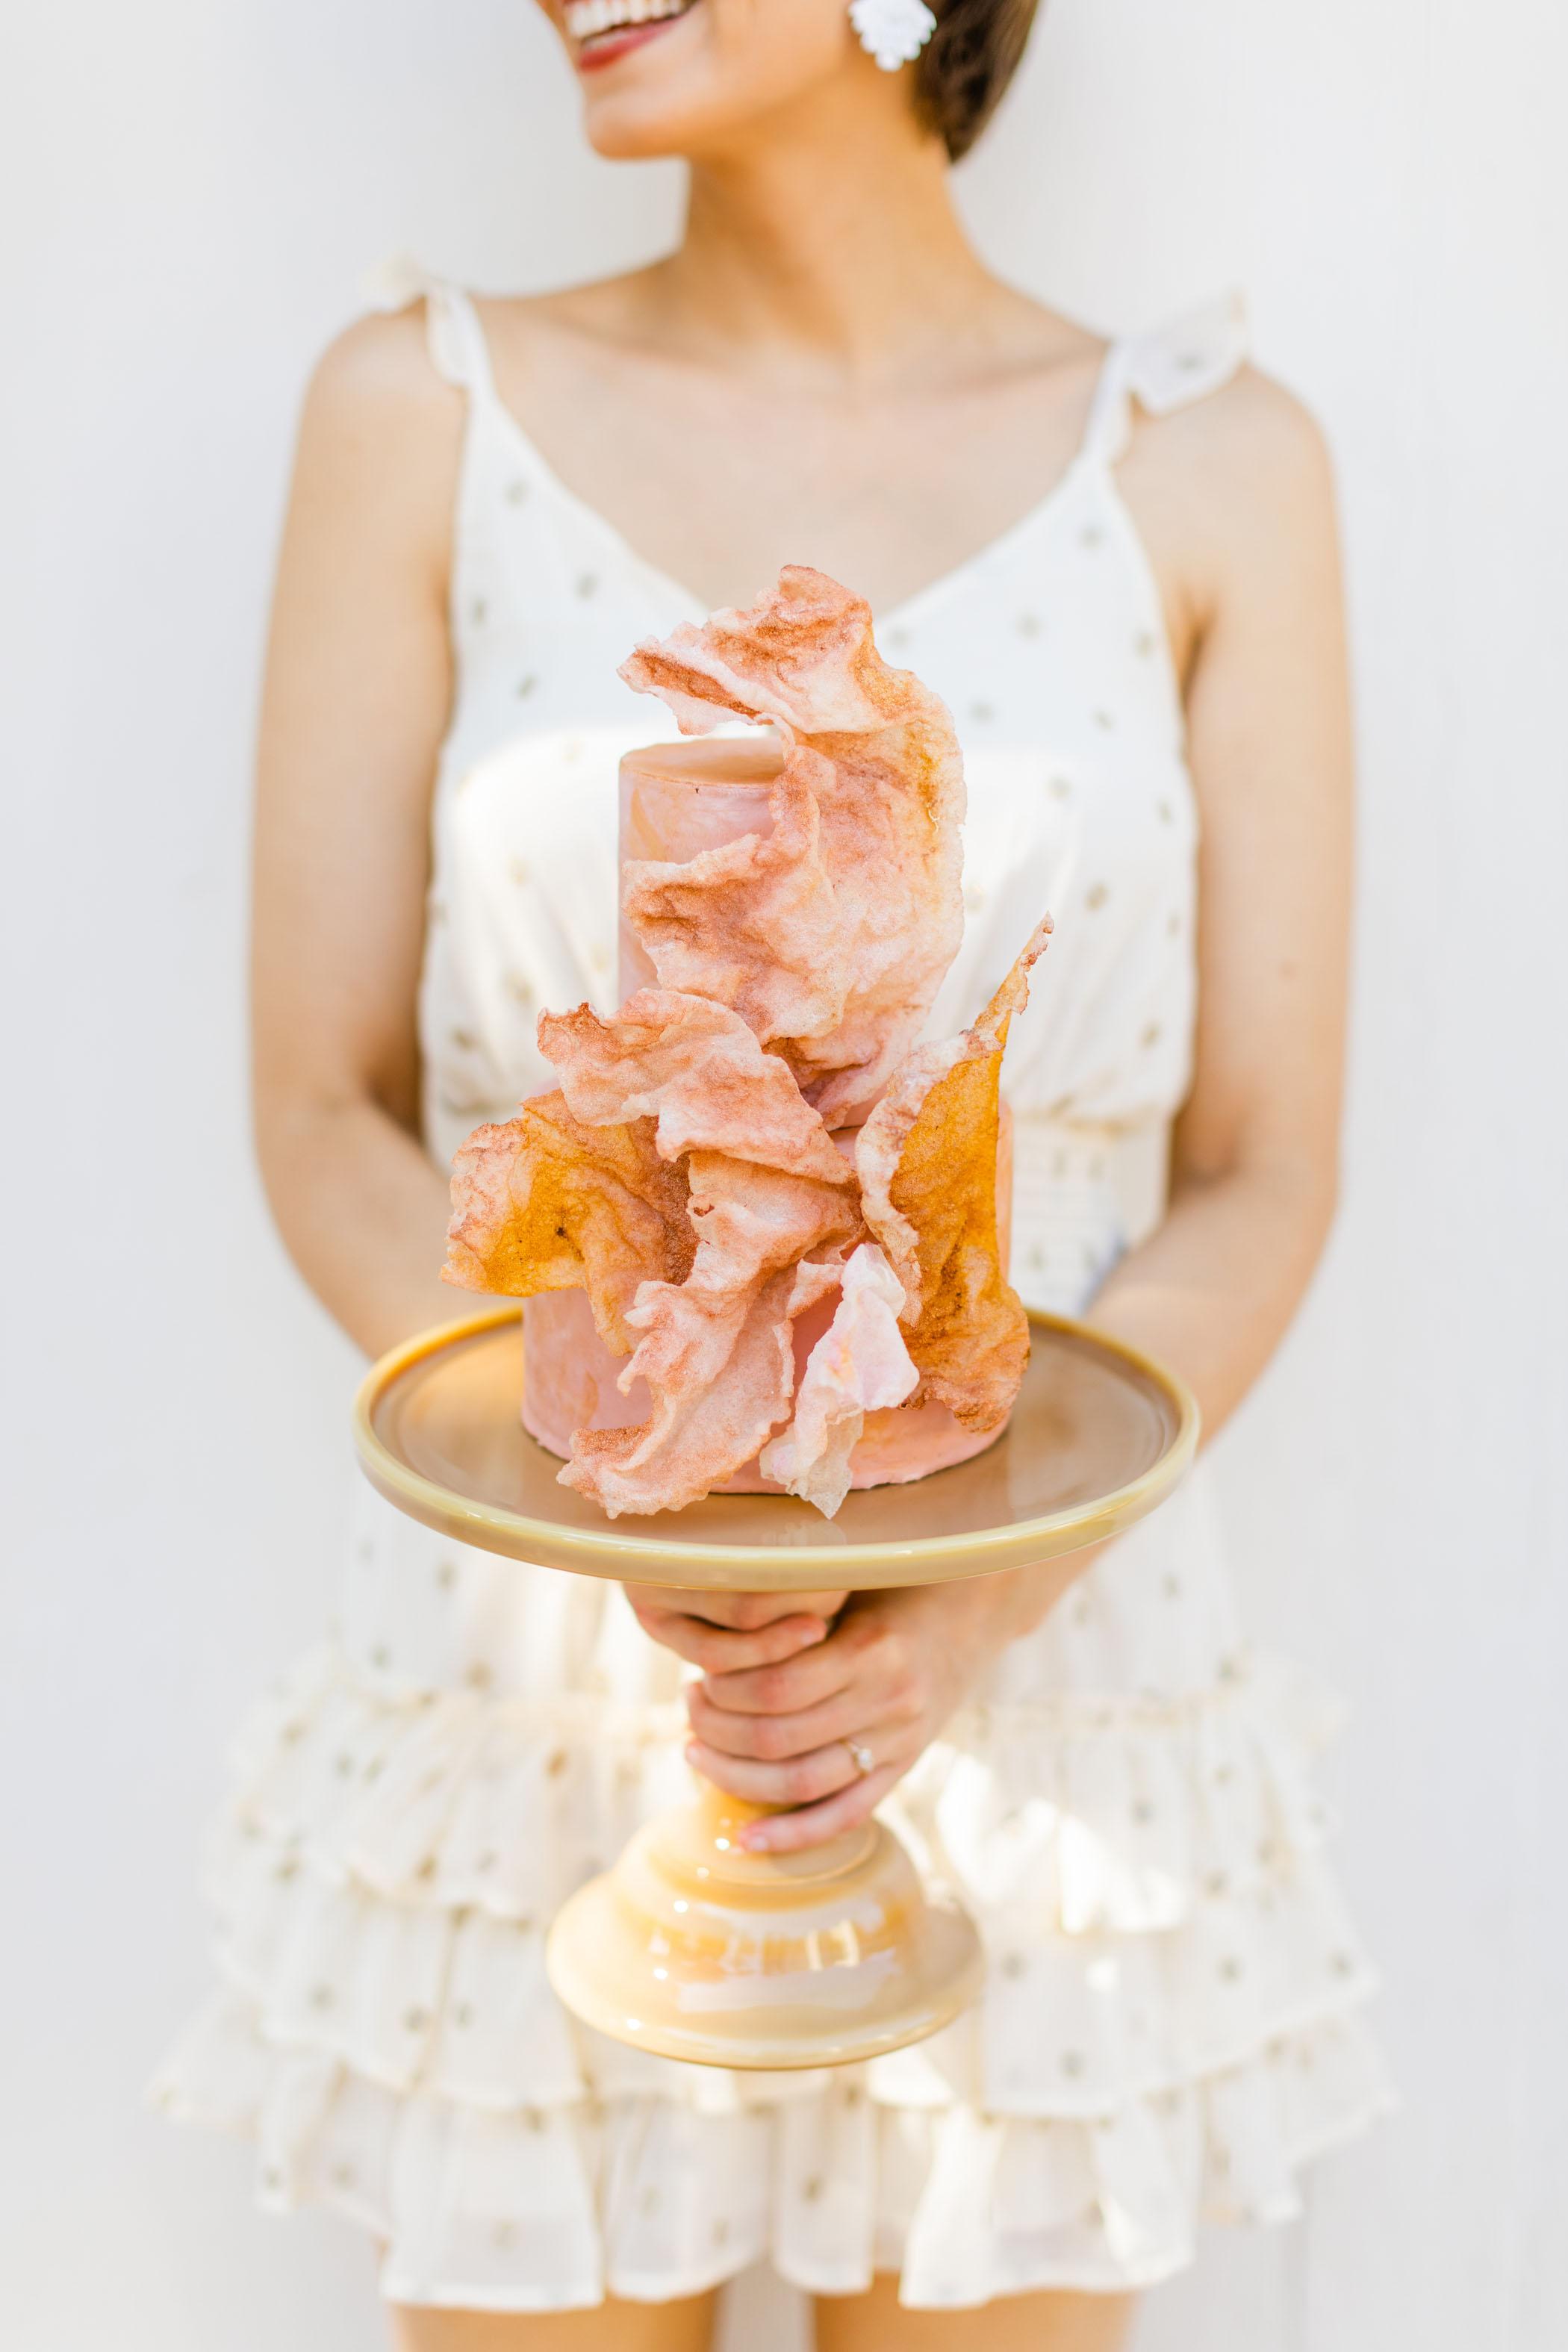 Small Unique Cake for a Bridal Shower